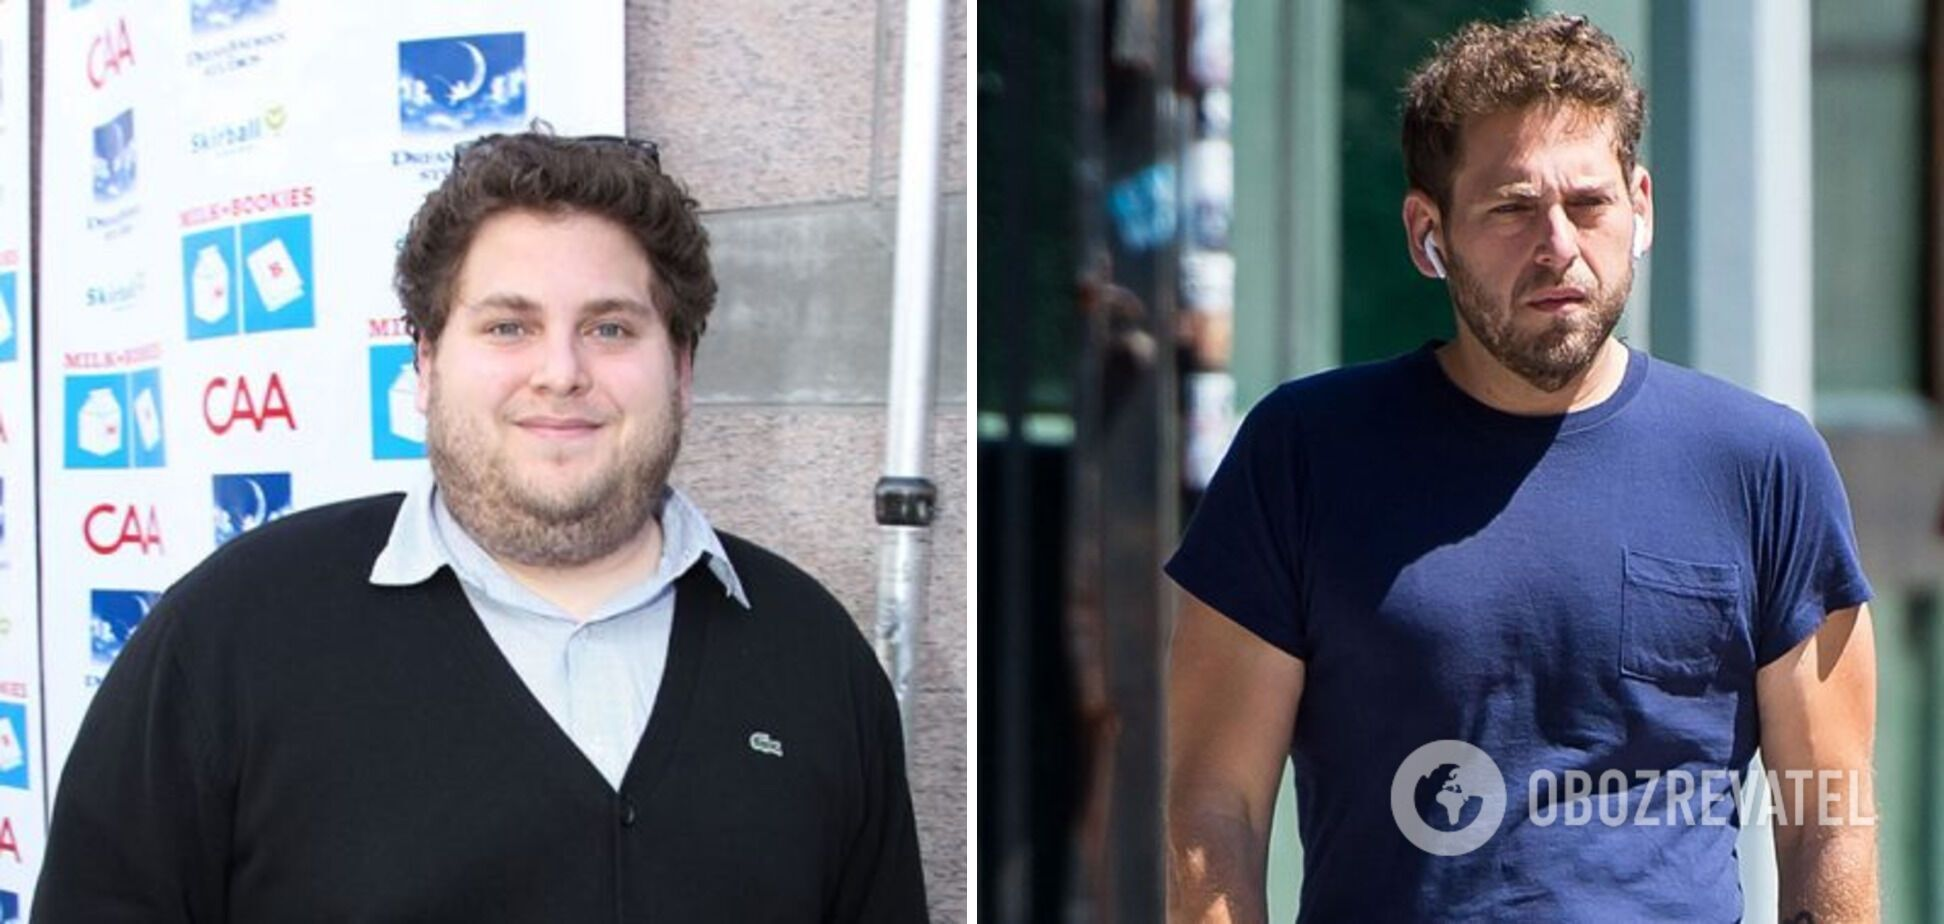 Джон Хилл похудел на 40 килограммов.